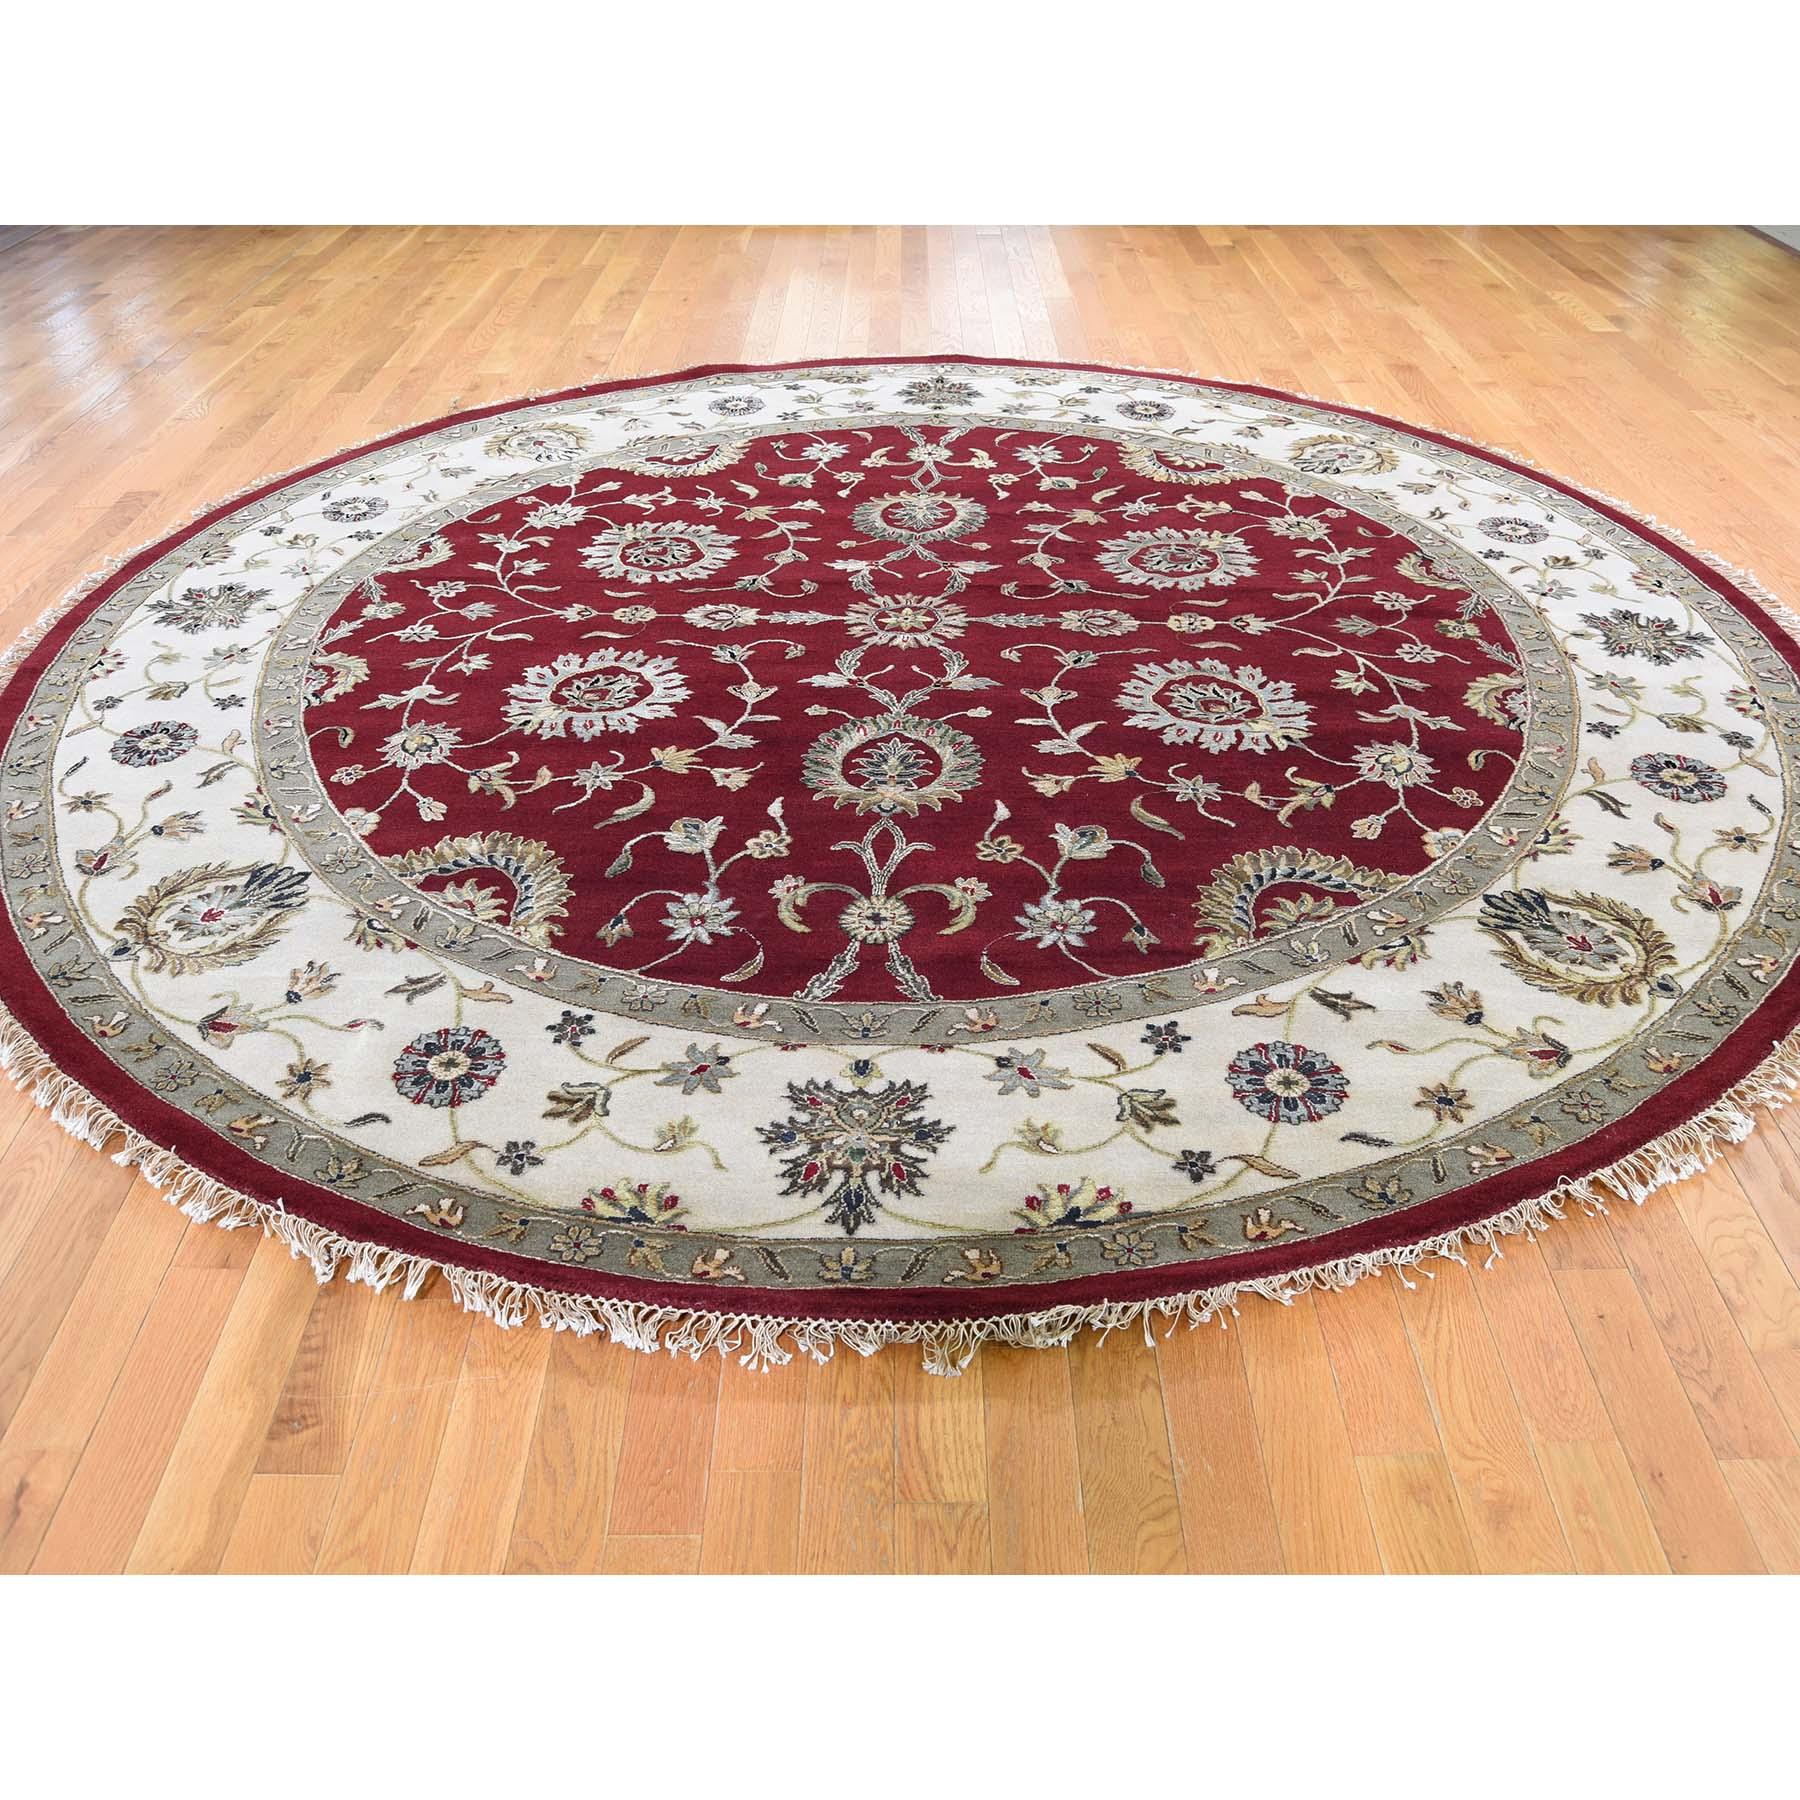 10-1 x10-1  Half Wool and Half Silk Burgundy Rajasthan Round Hand-Knotted Oriental Rug